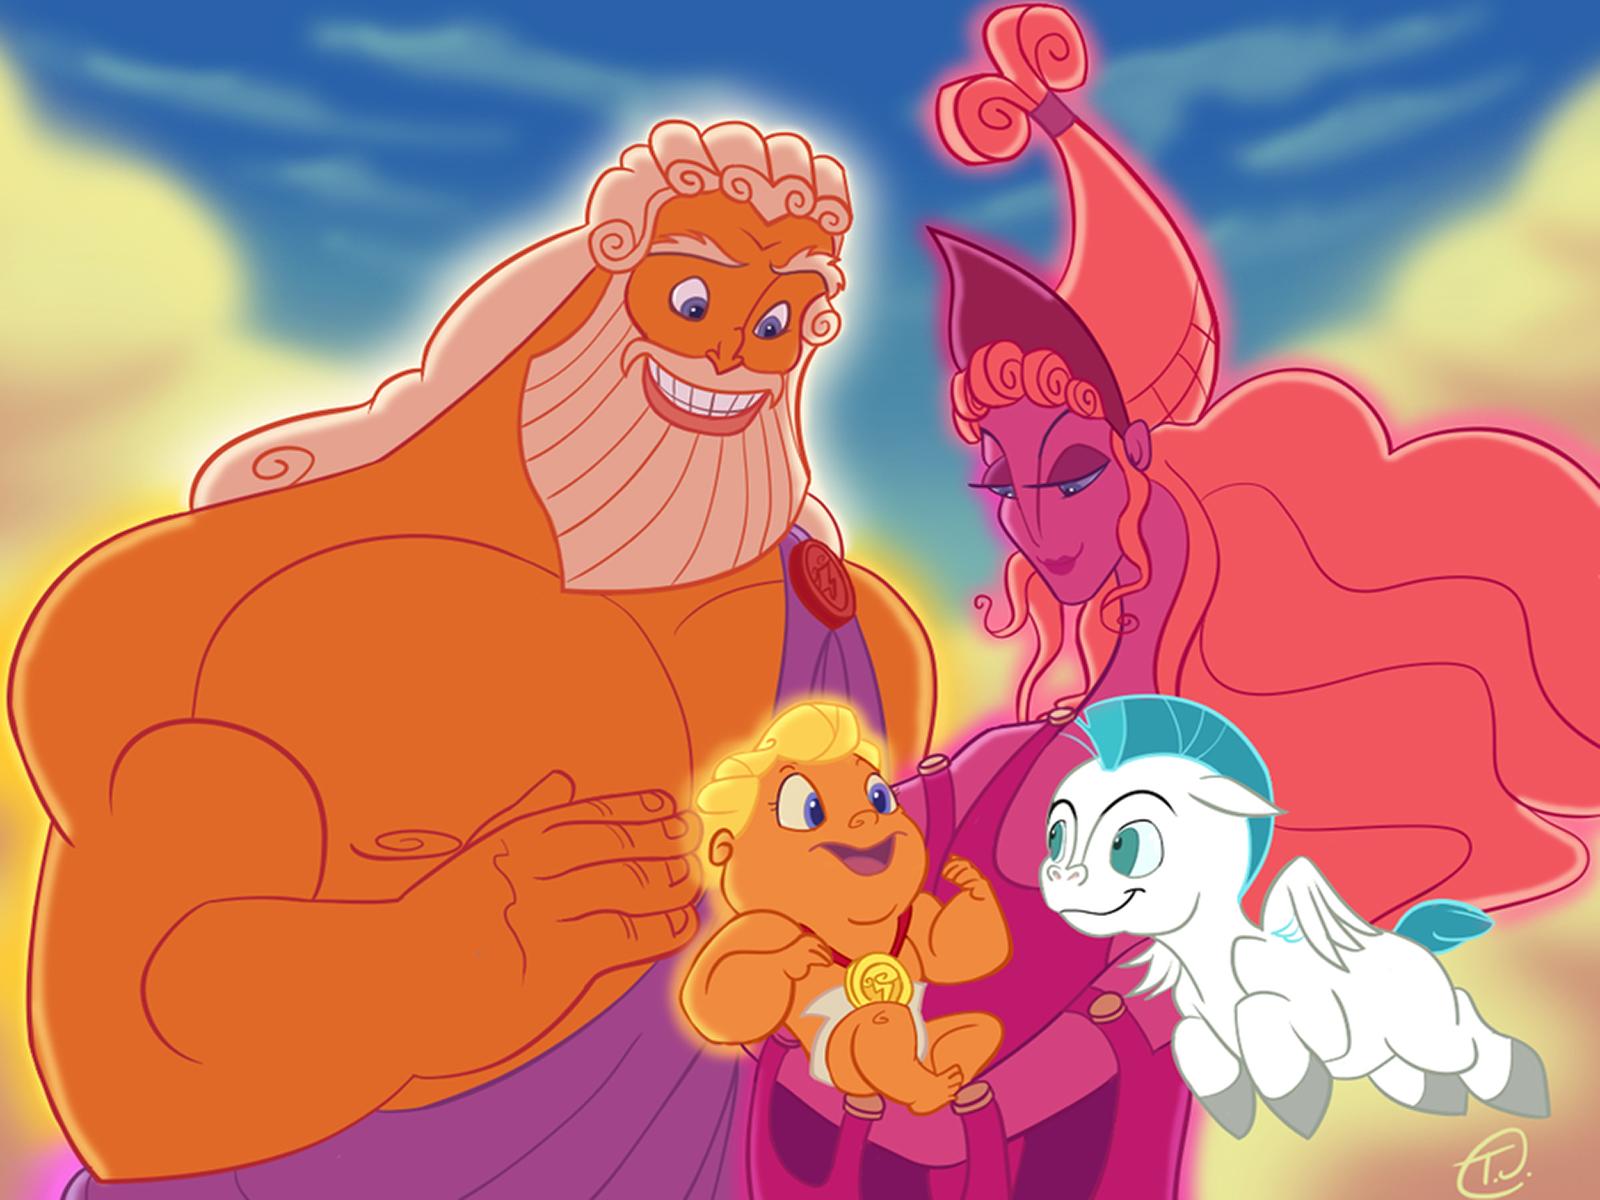 Hercules Retina Movie Wallpaper: Hercules (1997) Wallpaper And Background Image